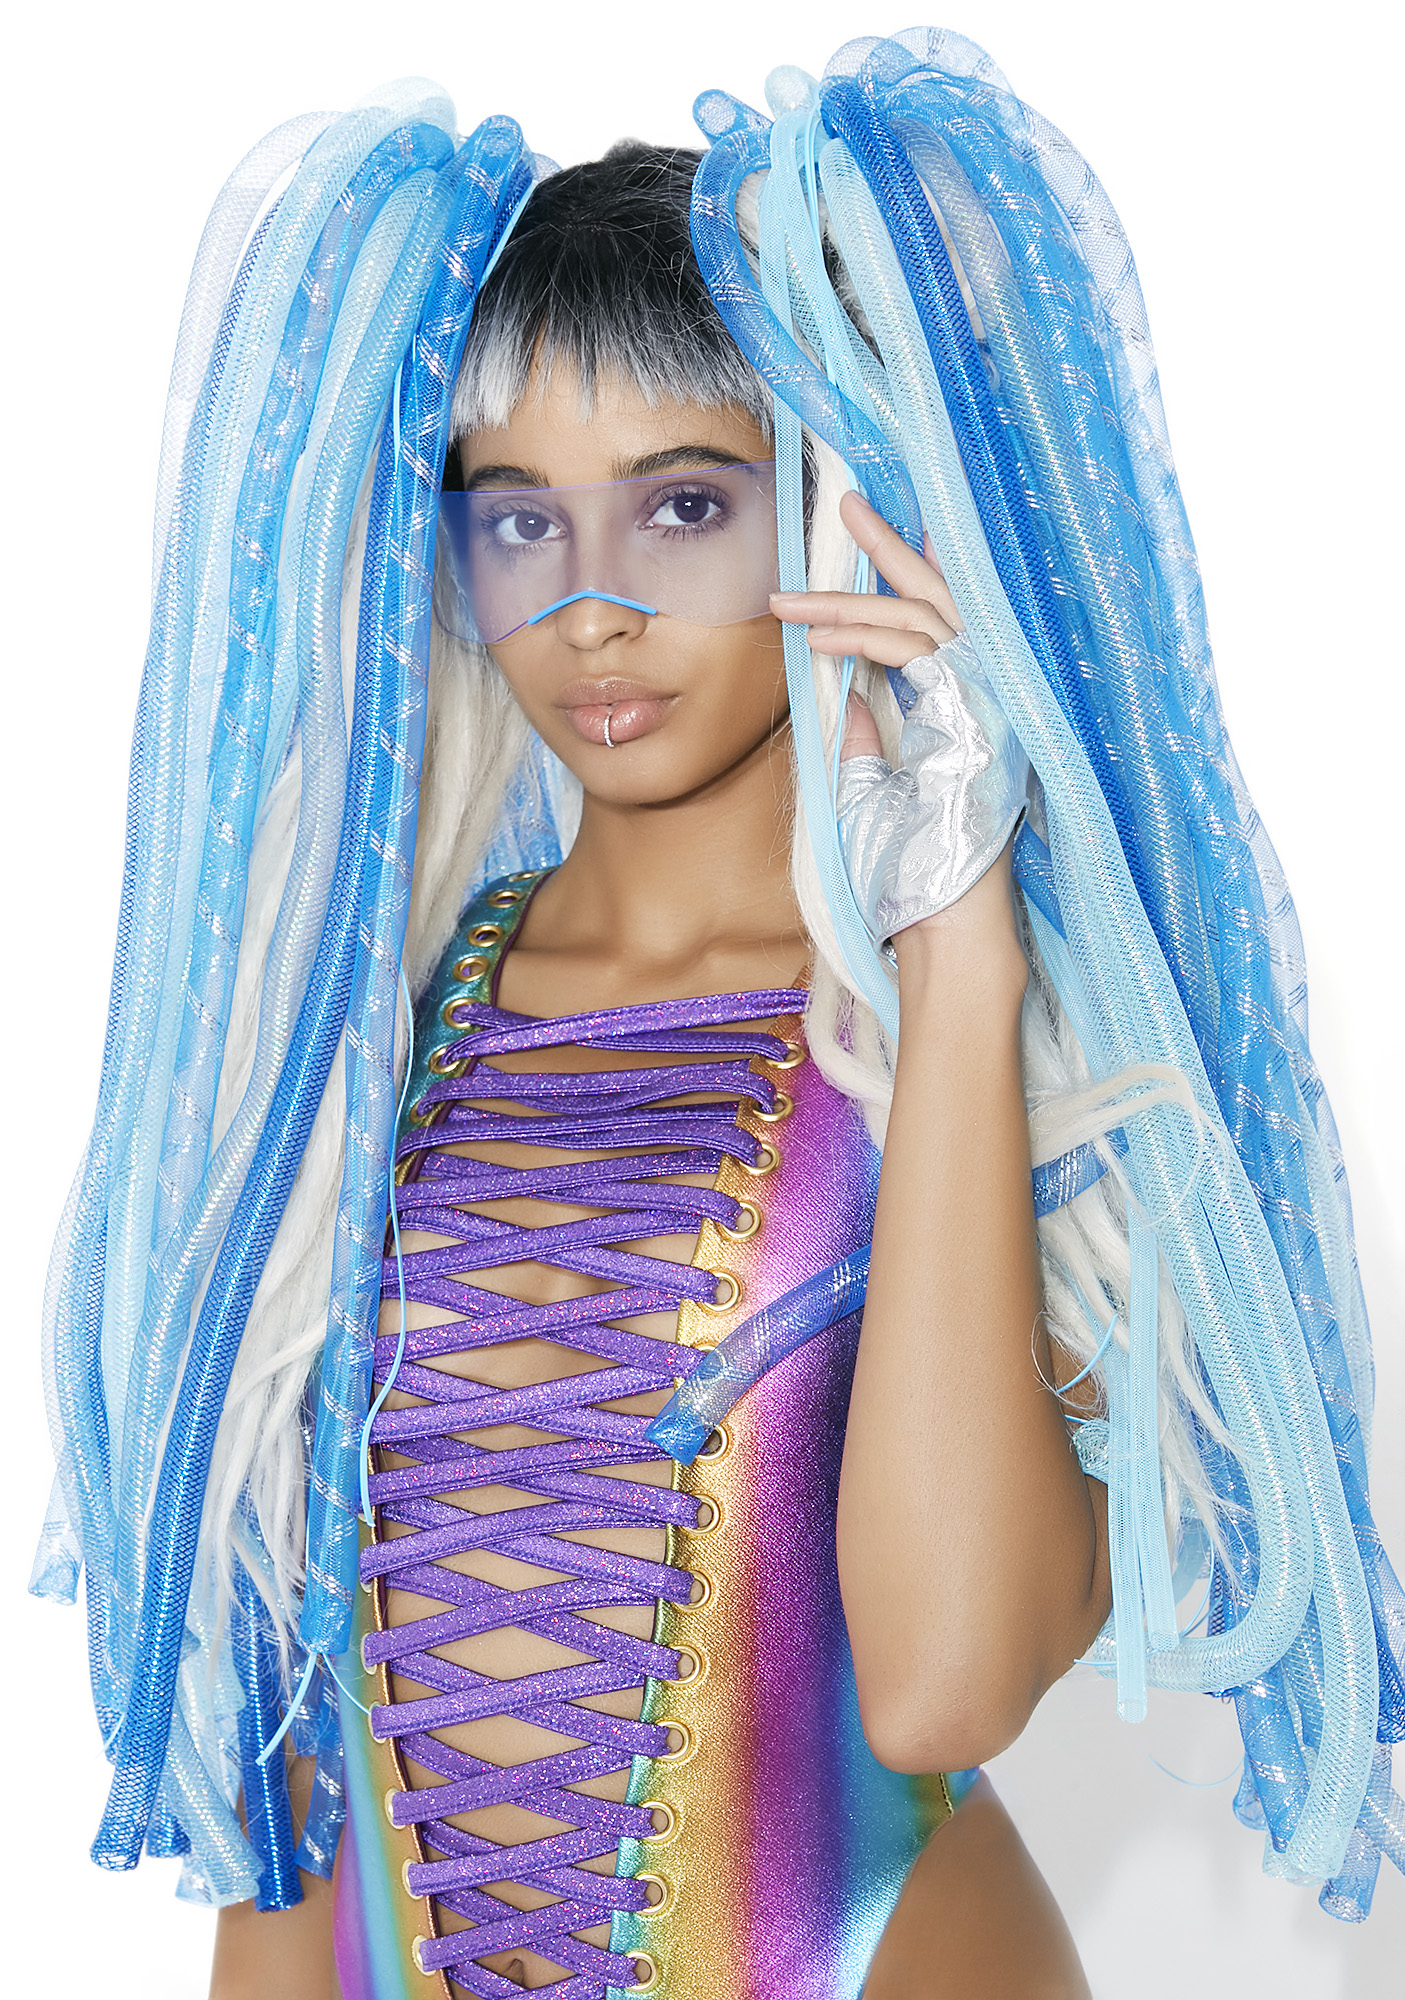 Aqua Cyberlox Tie-In Hair Falls